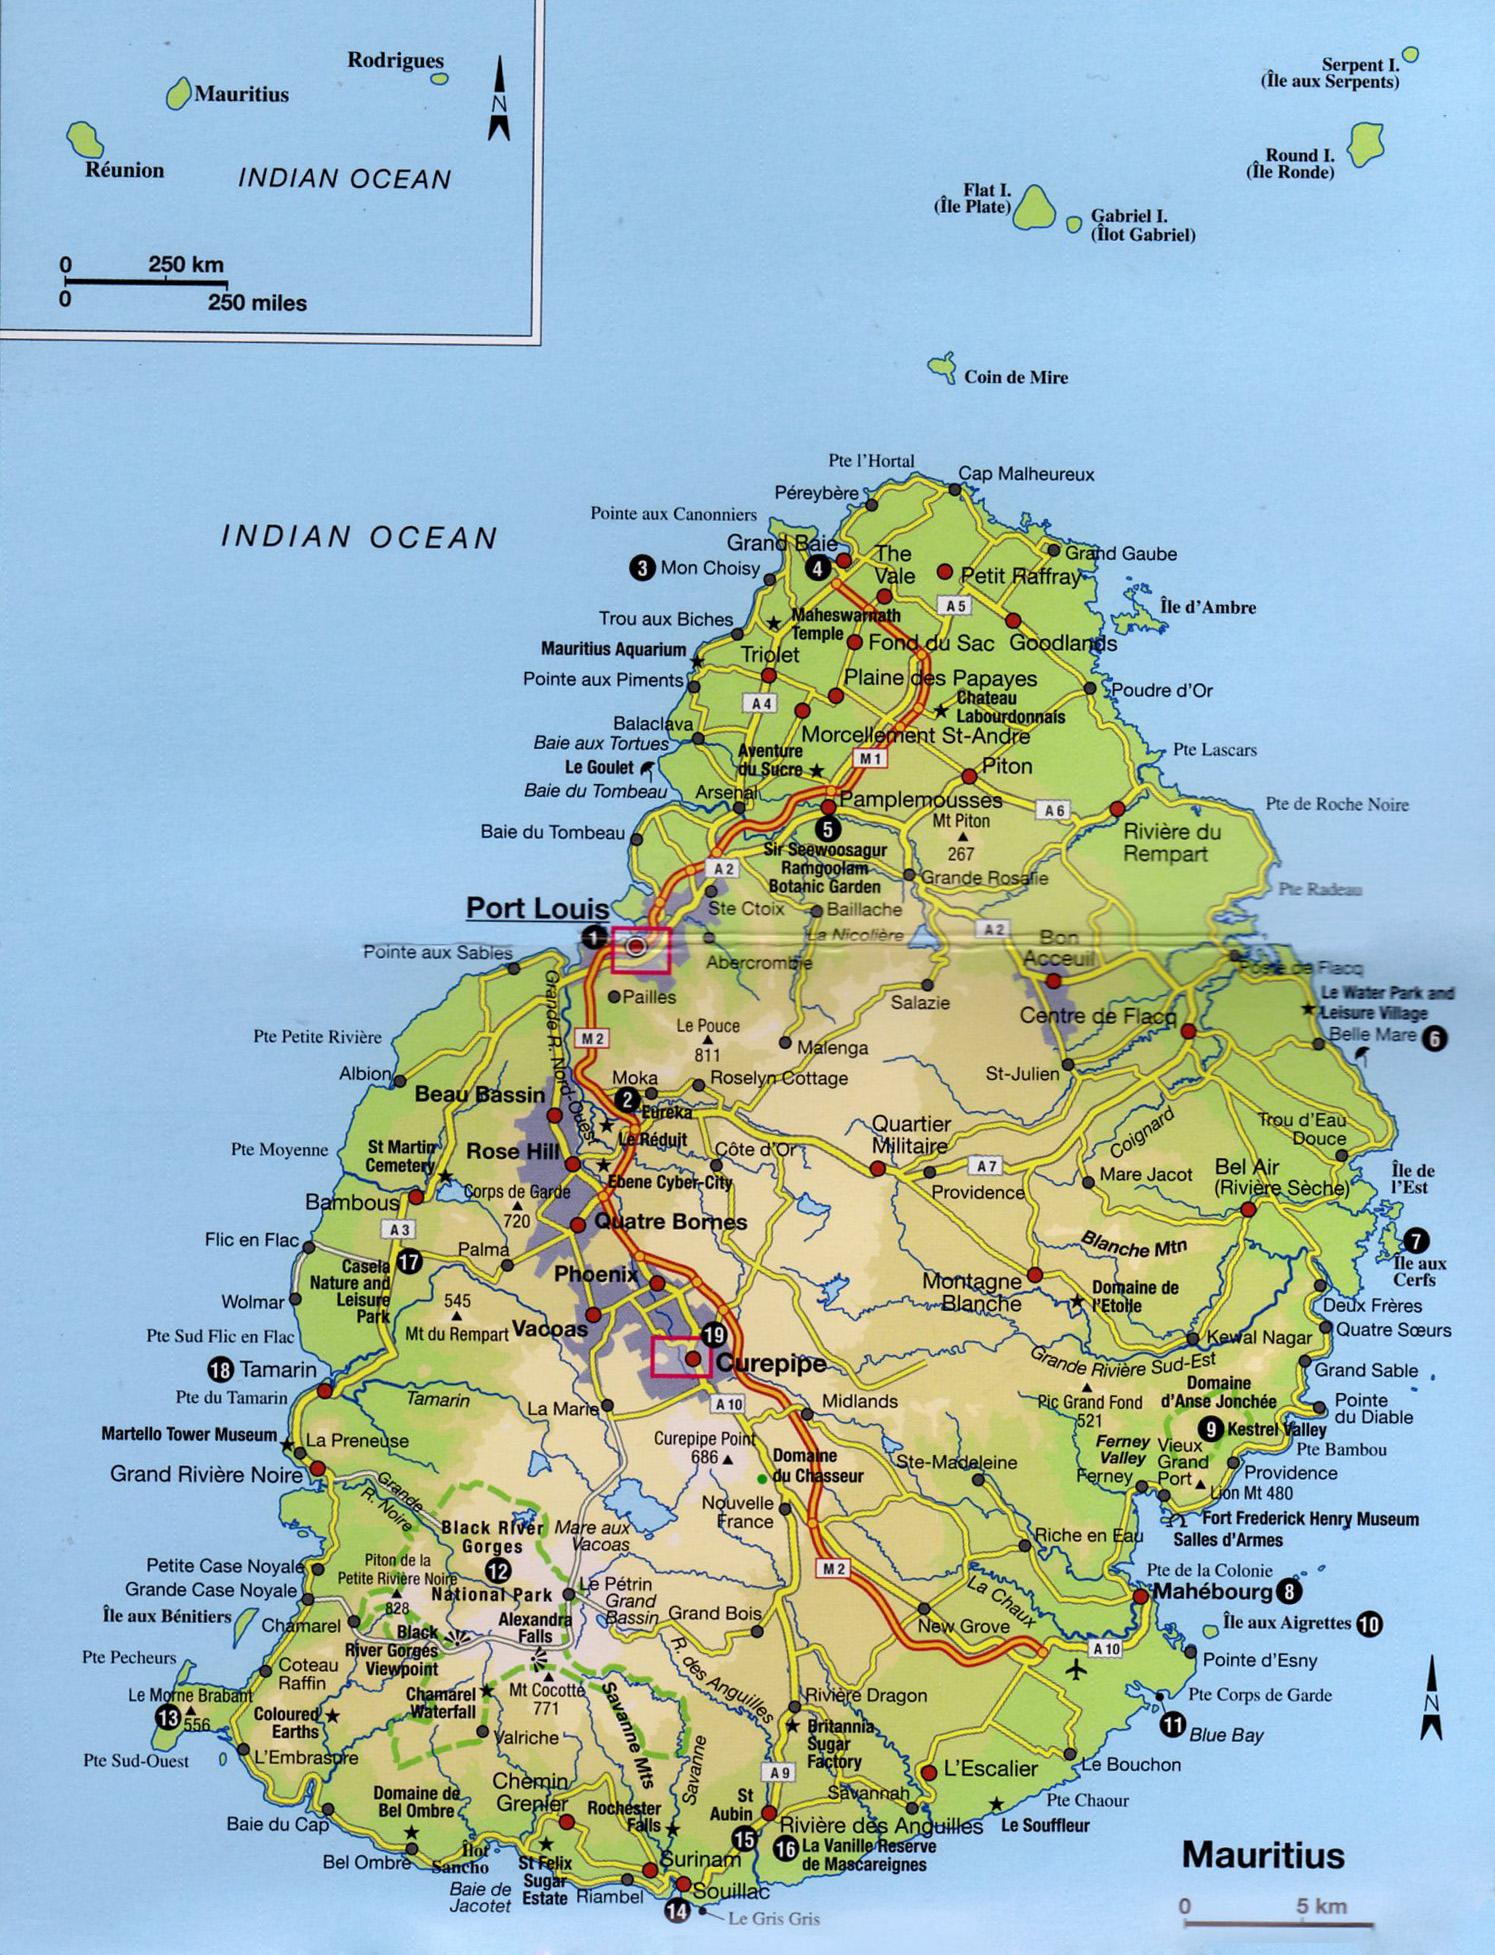 Image Mauritiusmap1003jpg Alternative History FANDOM